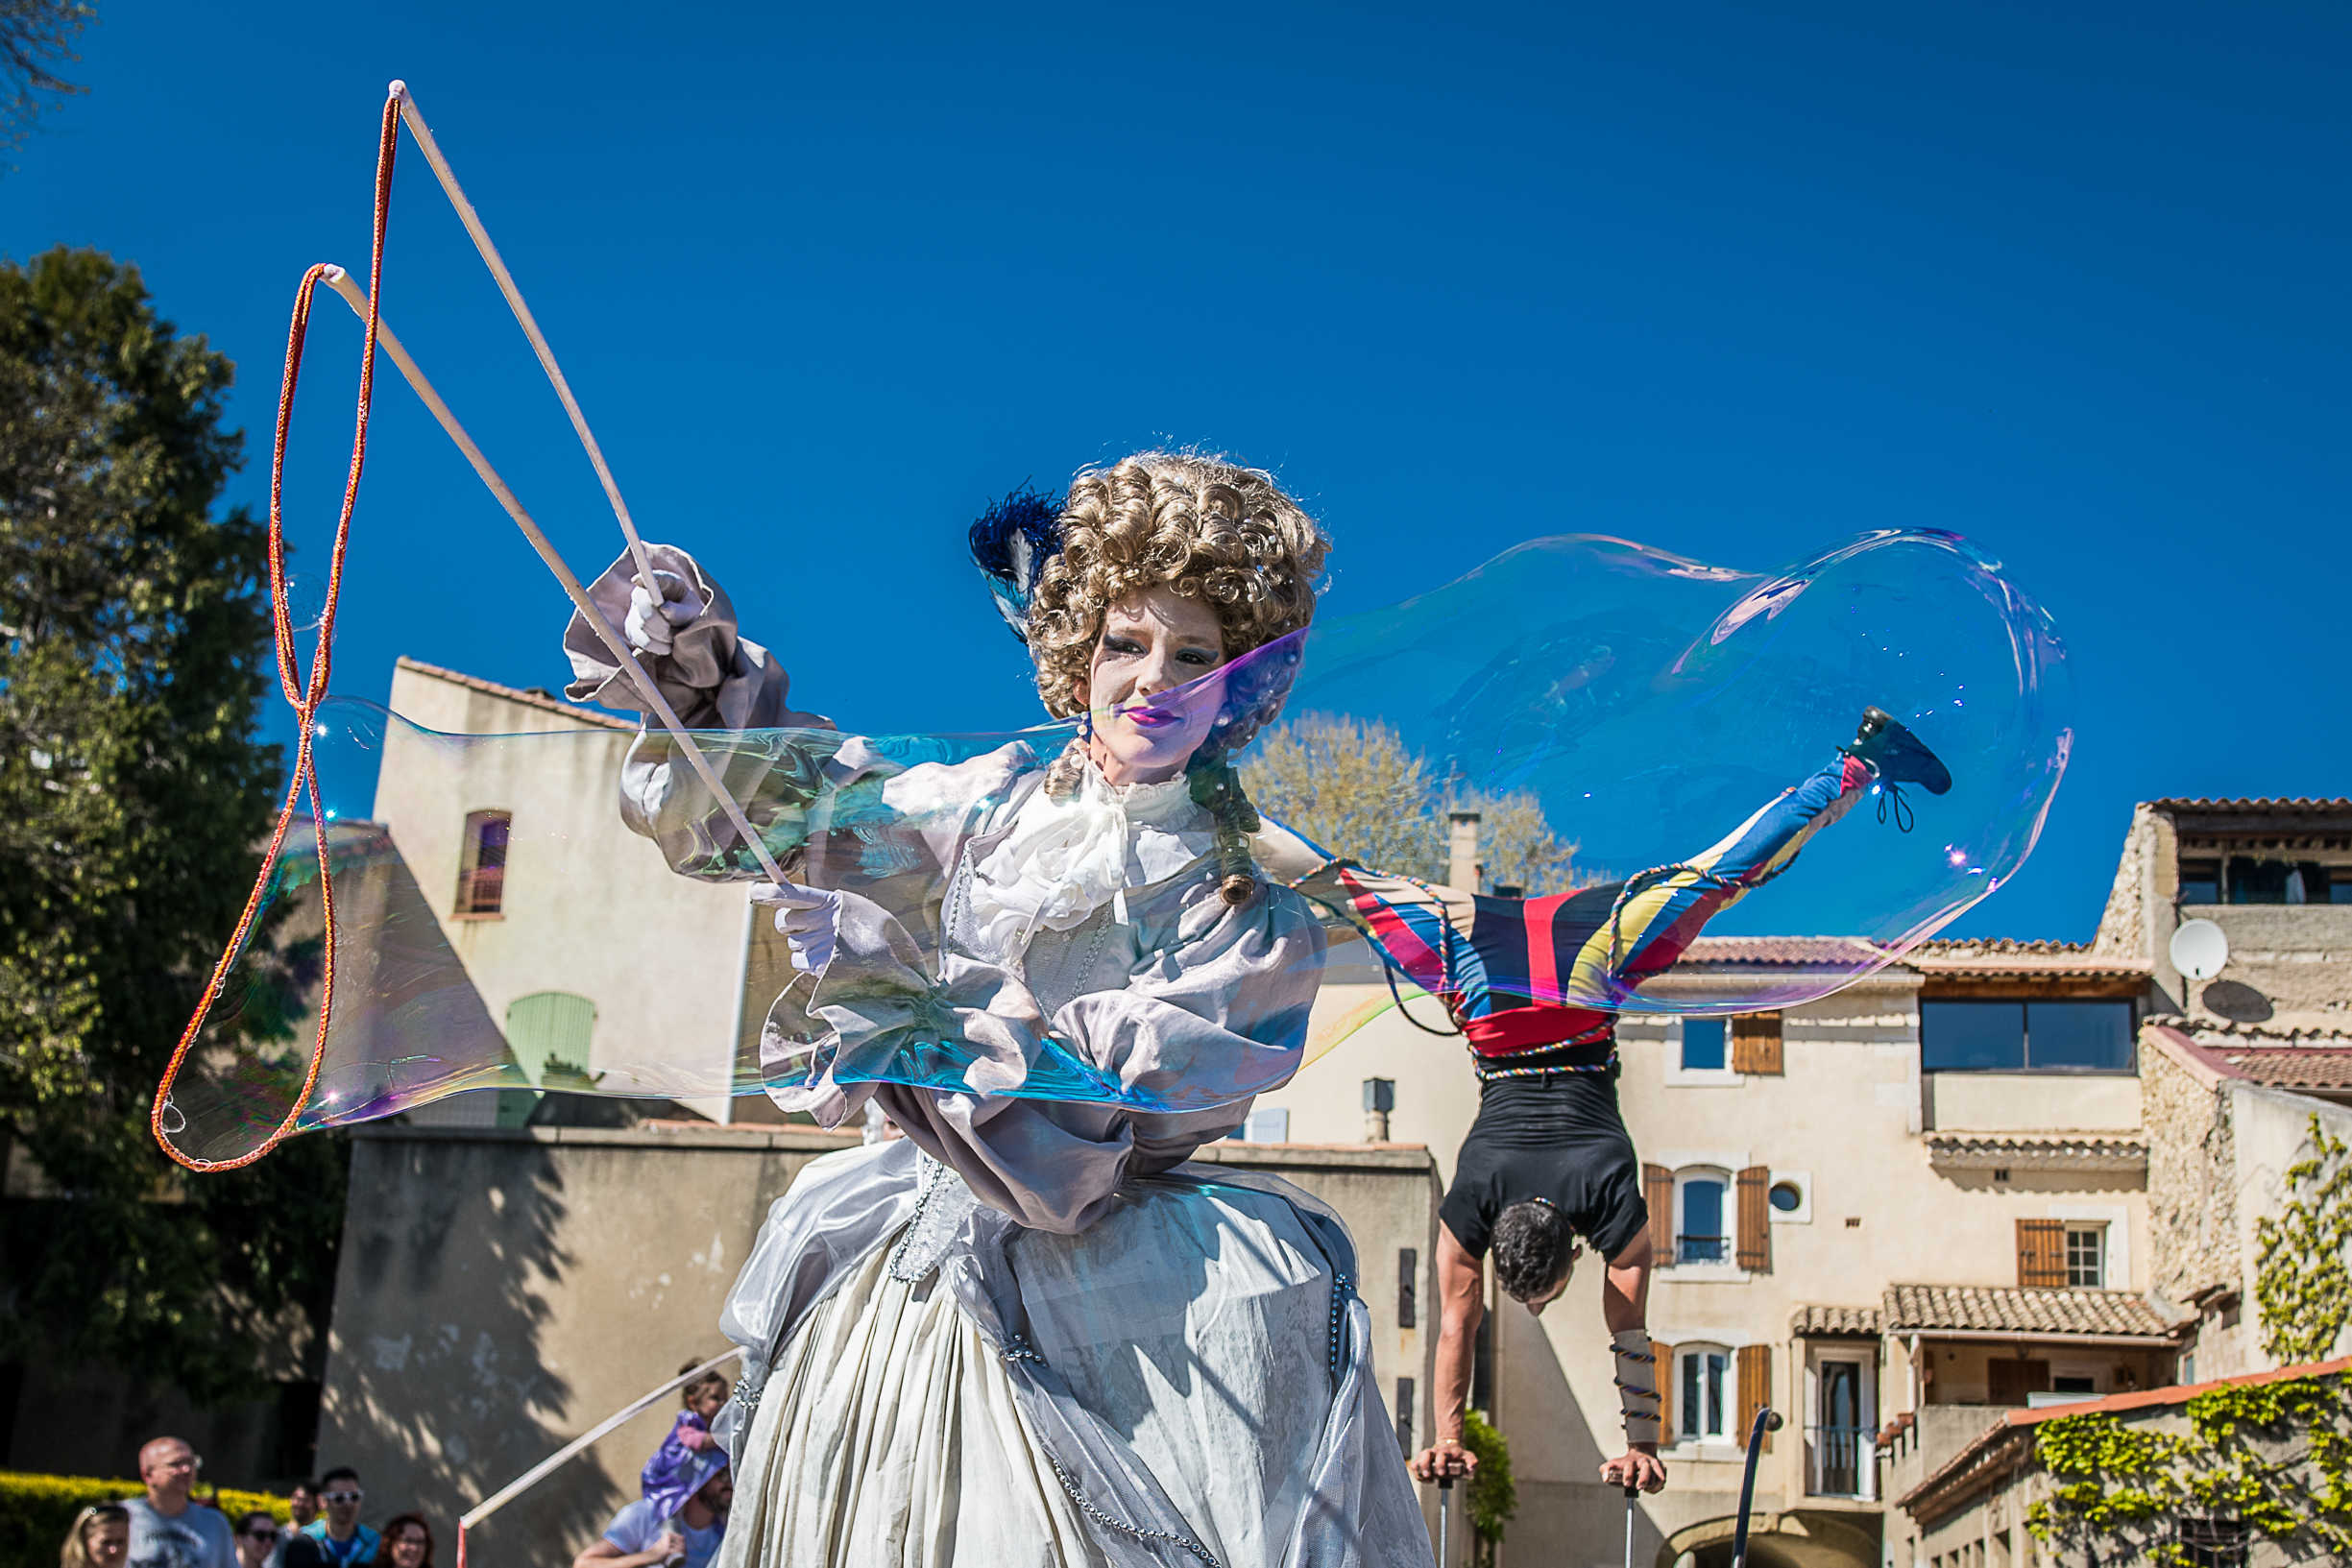 carnaval-marquise-baroque-bulles-de-savon-acrobate-arlequin